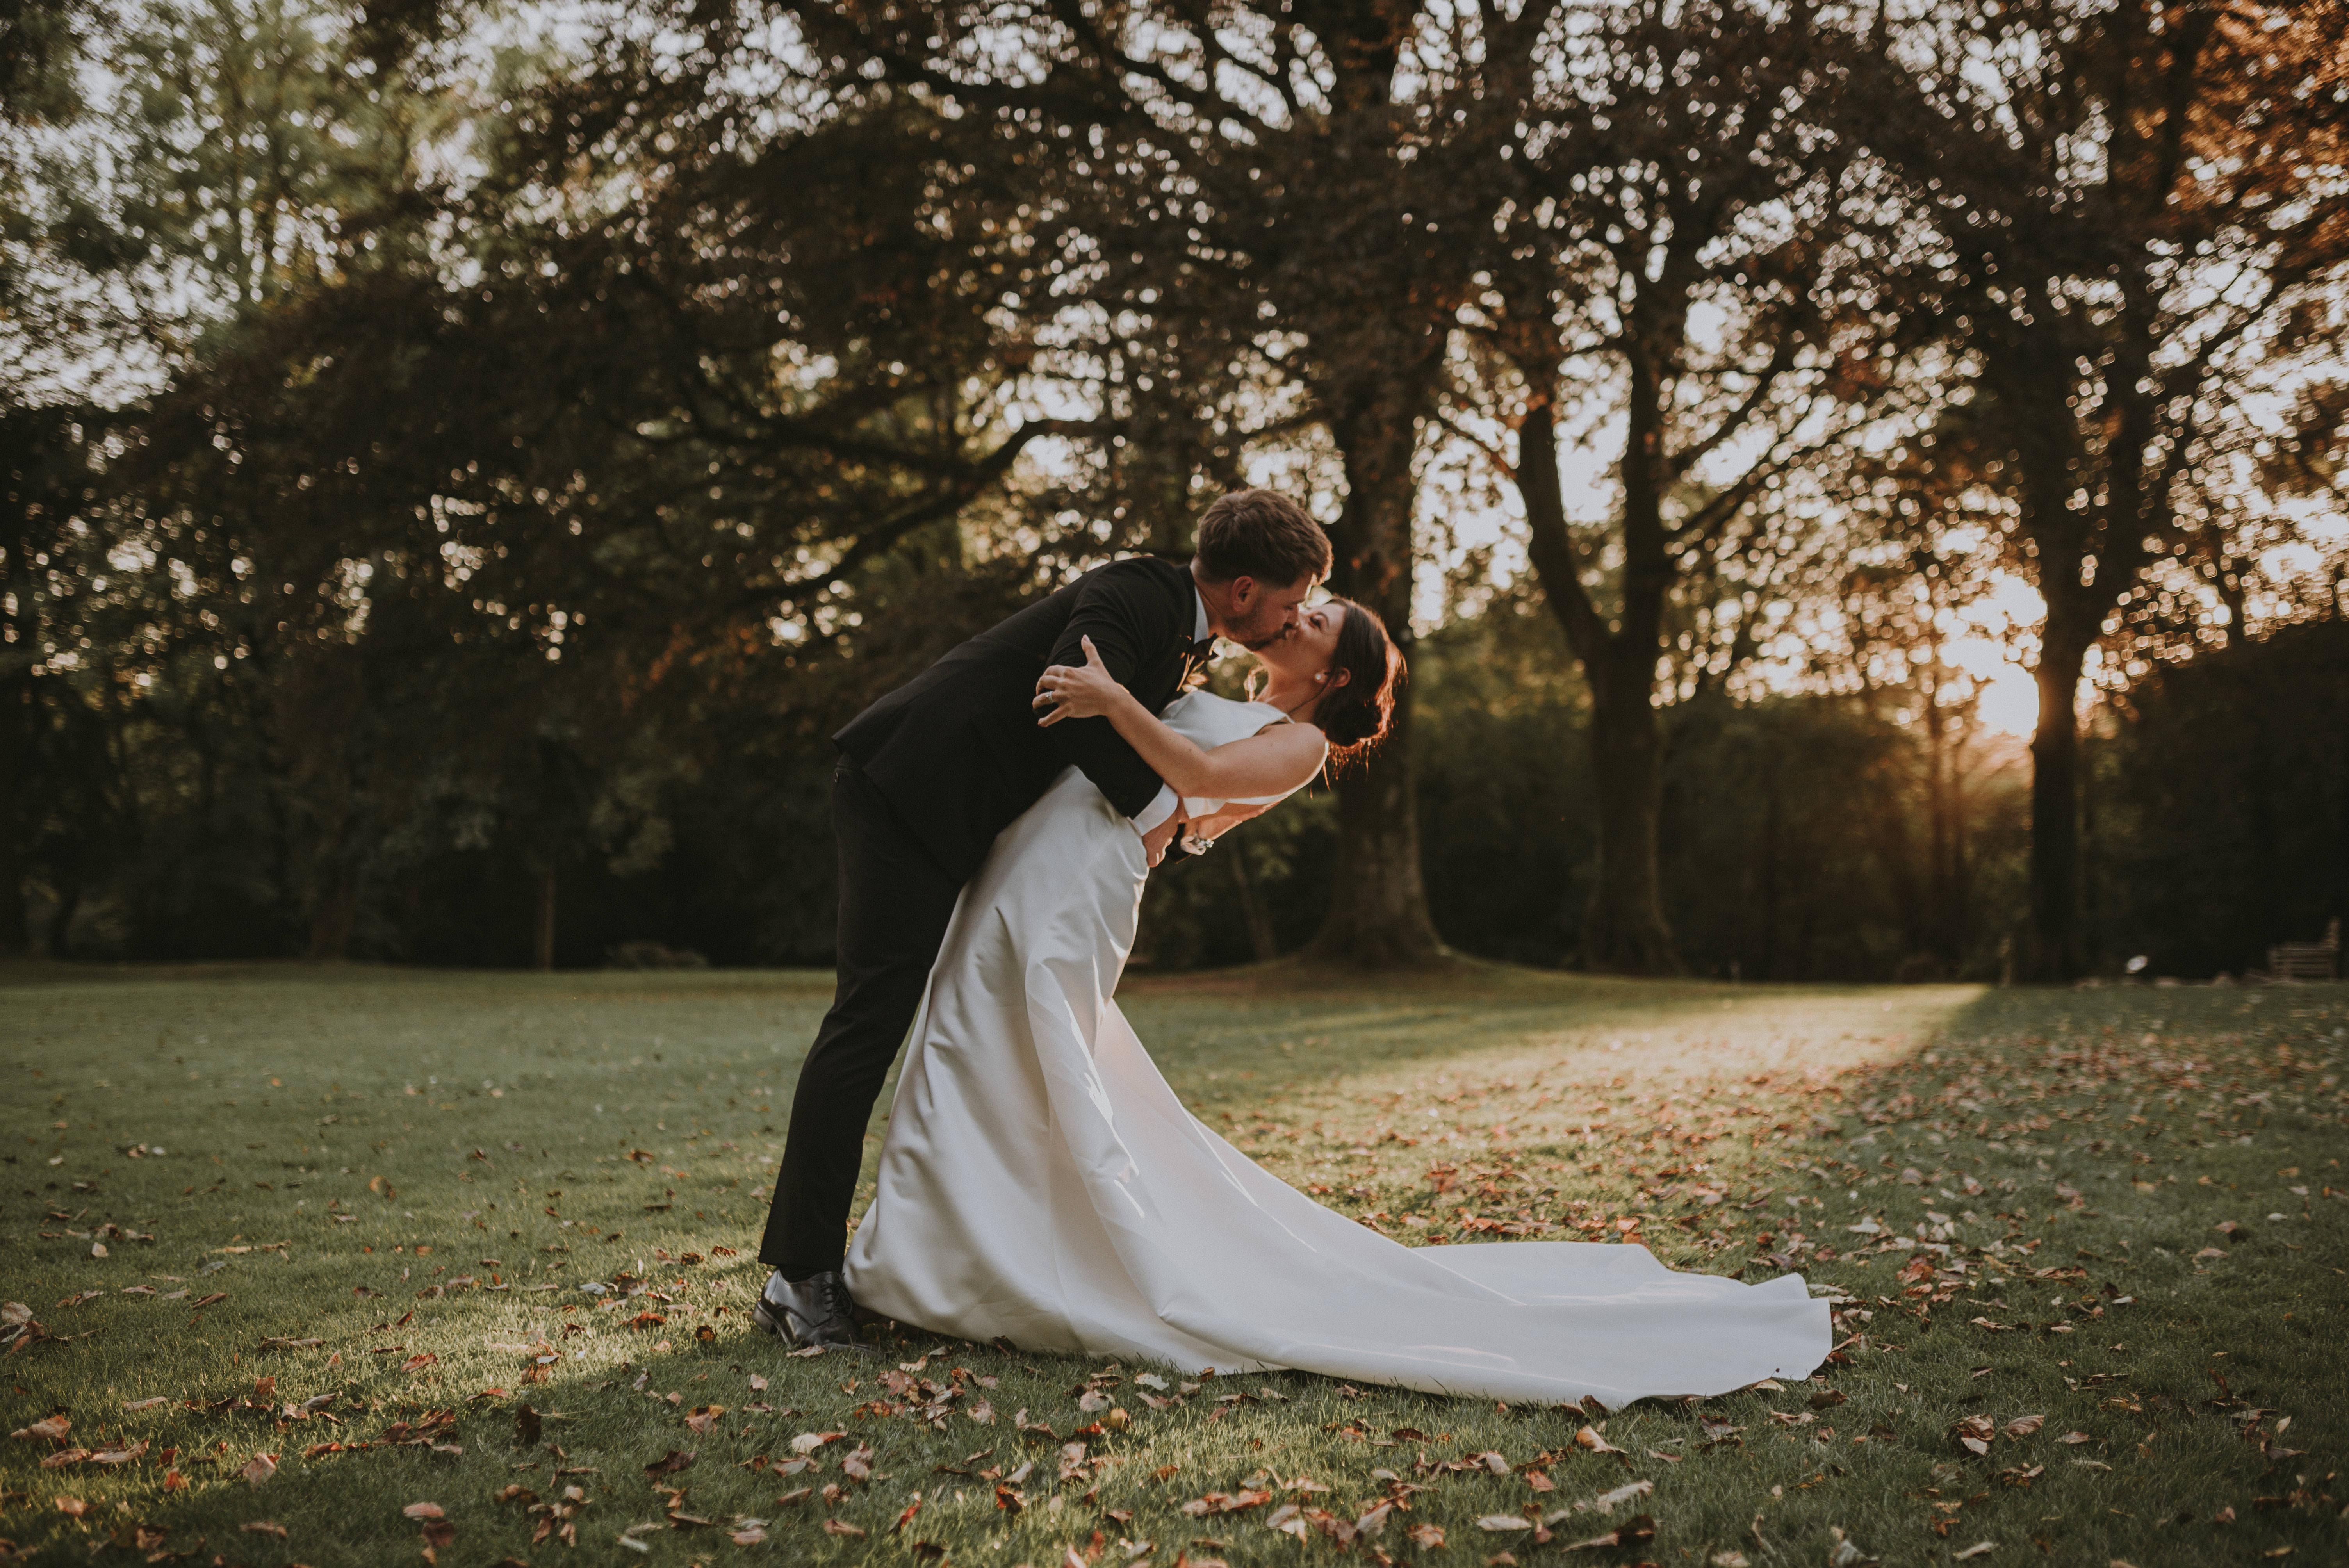 Wales bohemian wedding photographer